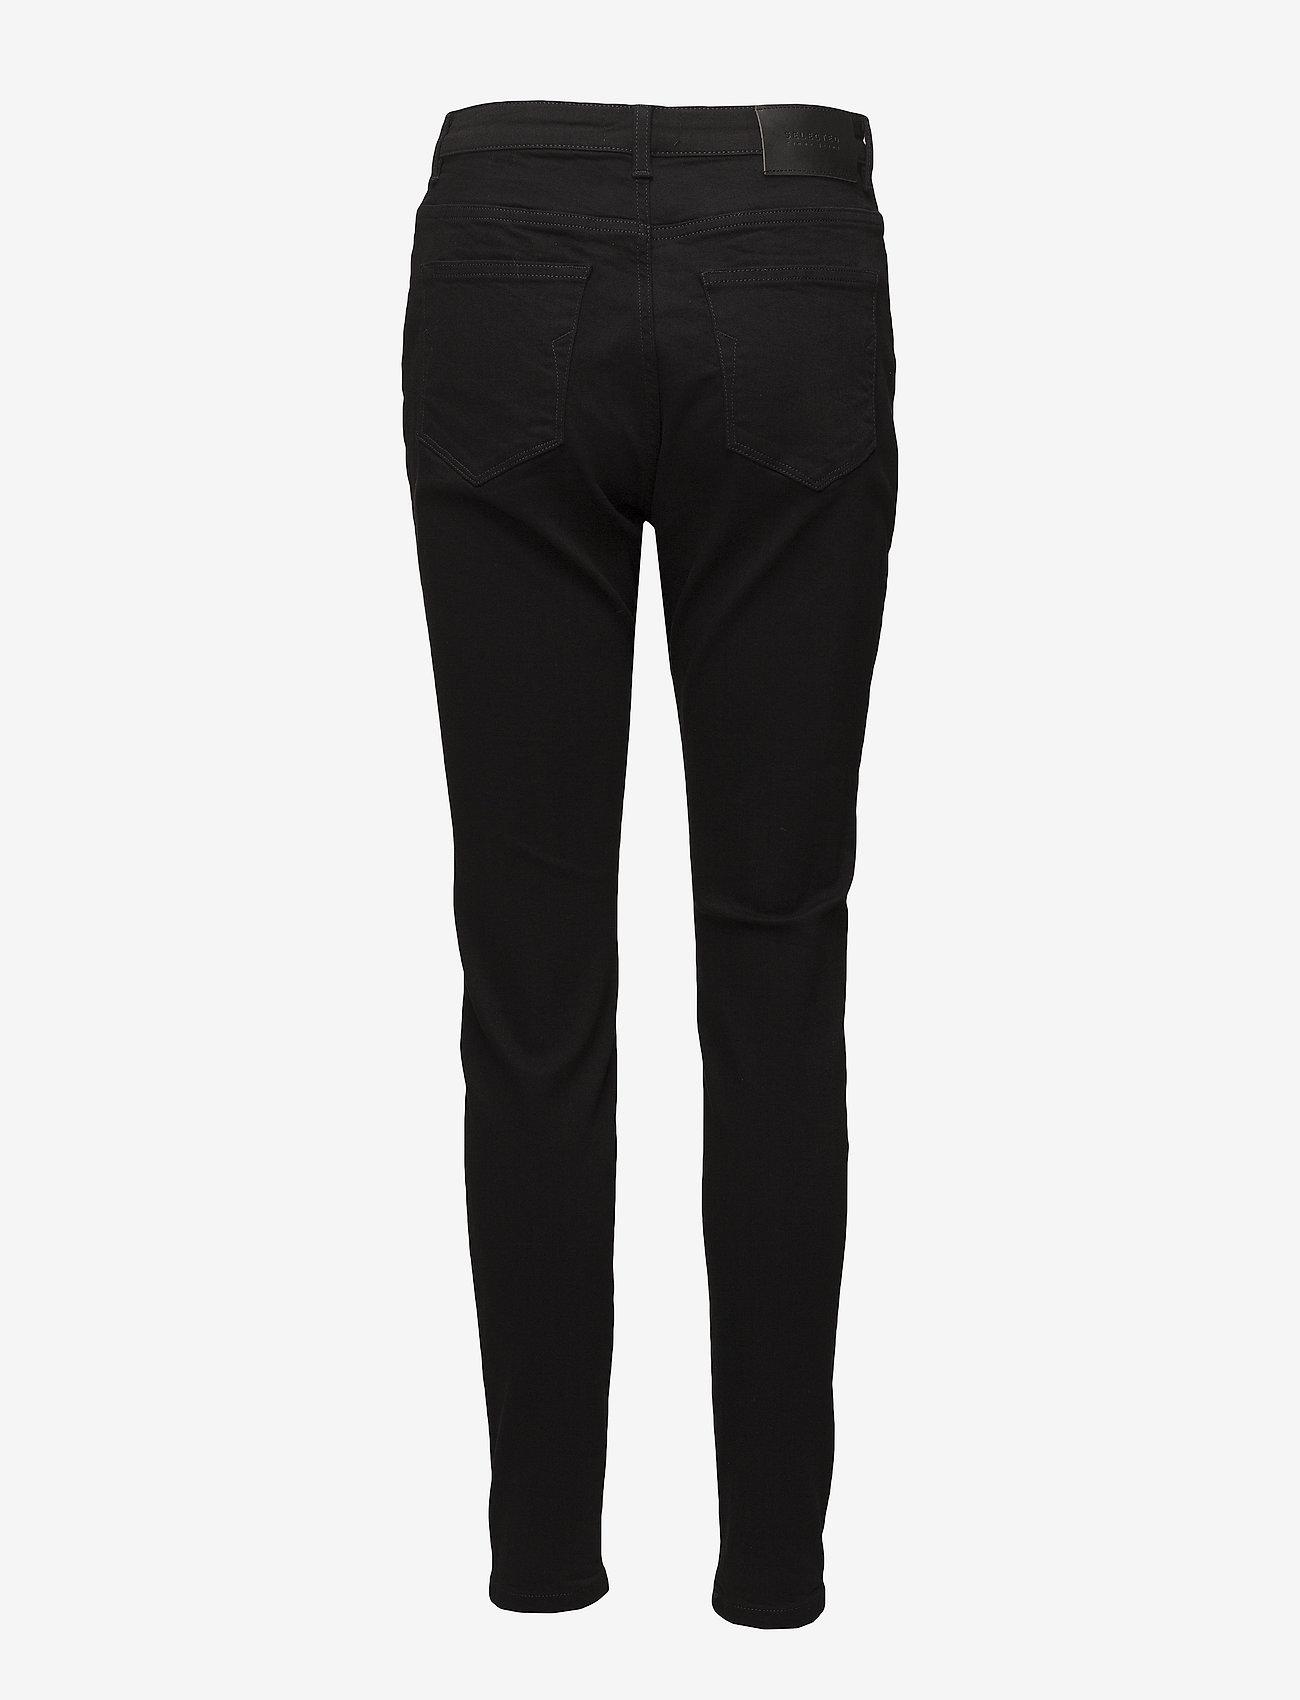 Selected Femme - SLFMAGGIE HW SKINNY BLACK JEANS W NOOS - pillihousut - black - 1